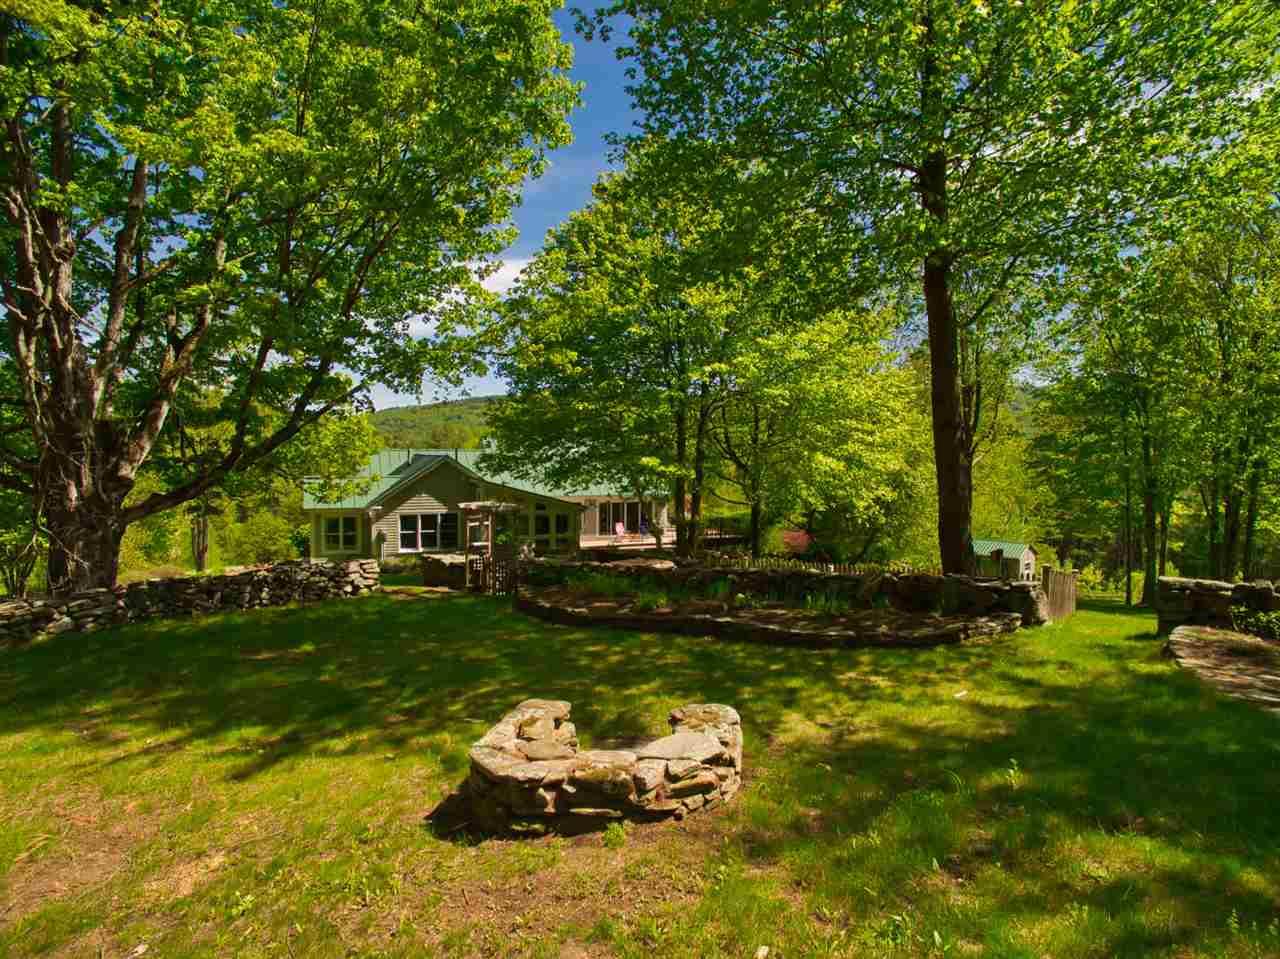 Mount-Snow-Real-Estate-4634813-7